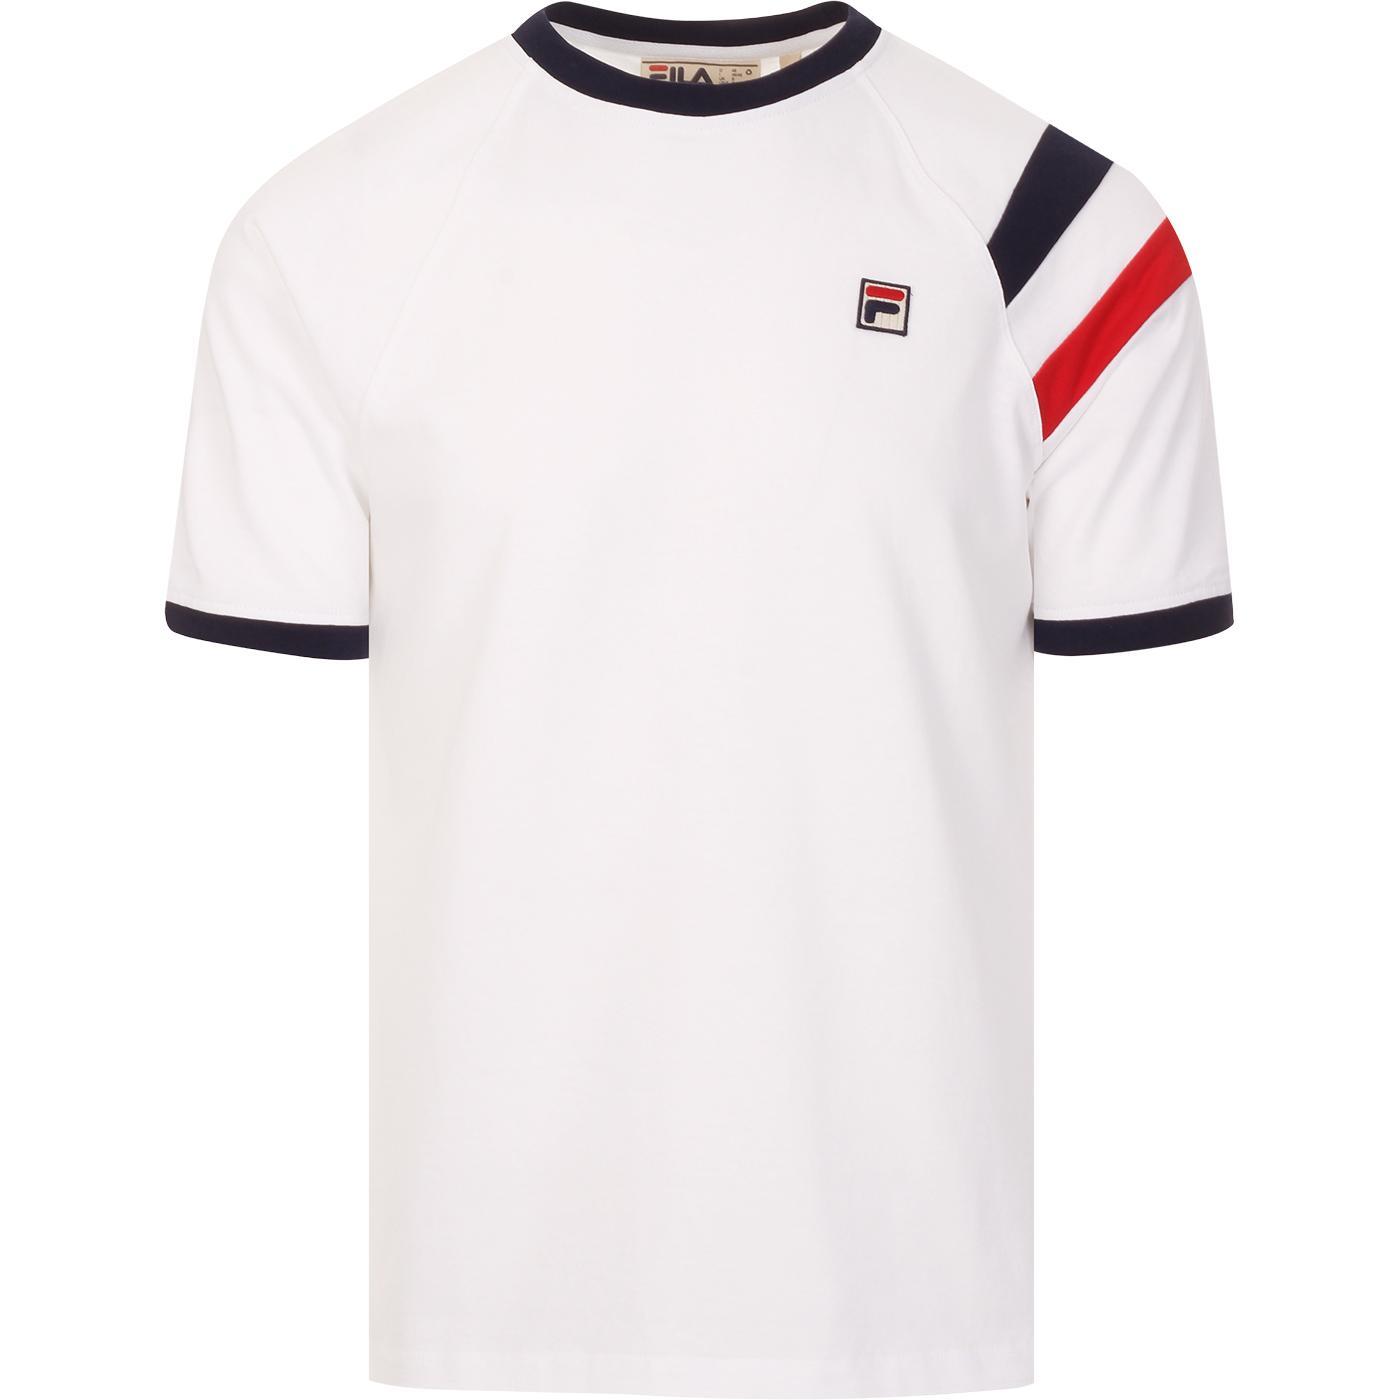 Roger FILA VINTAGE 80s Stripe Raglan Sleeve Tee W